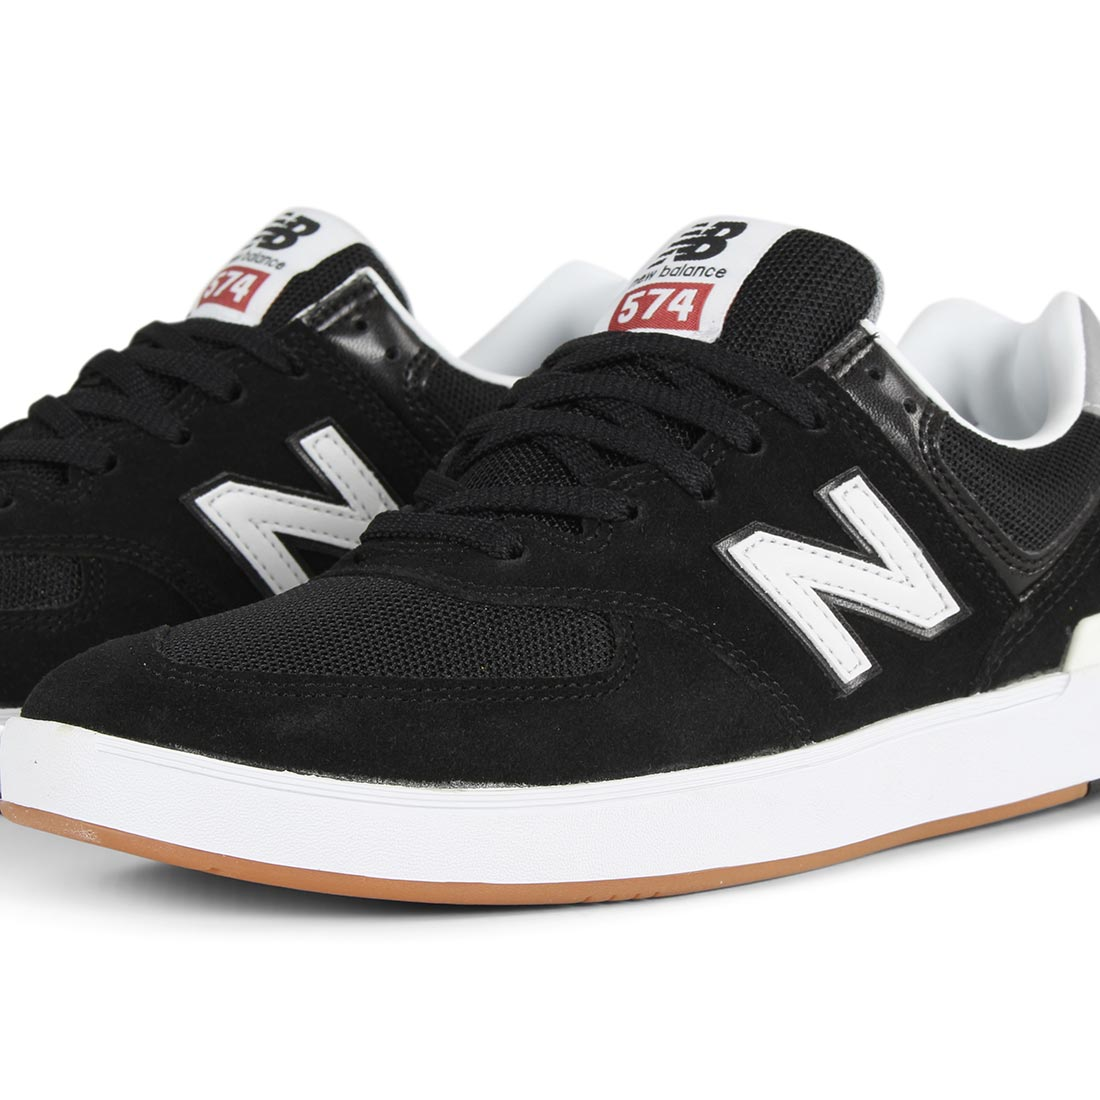 New Balance All Coasts 574 Shoes - Black / Grey